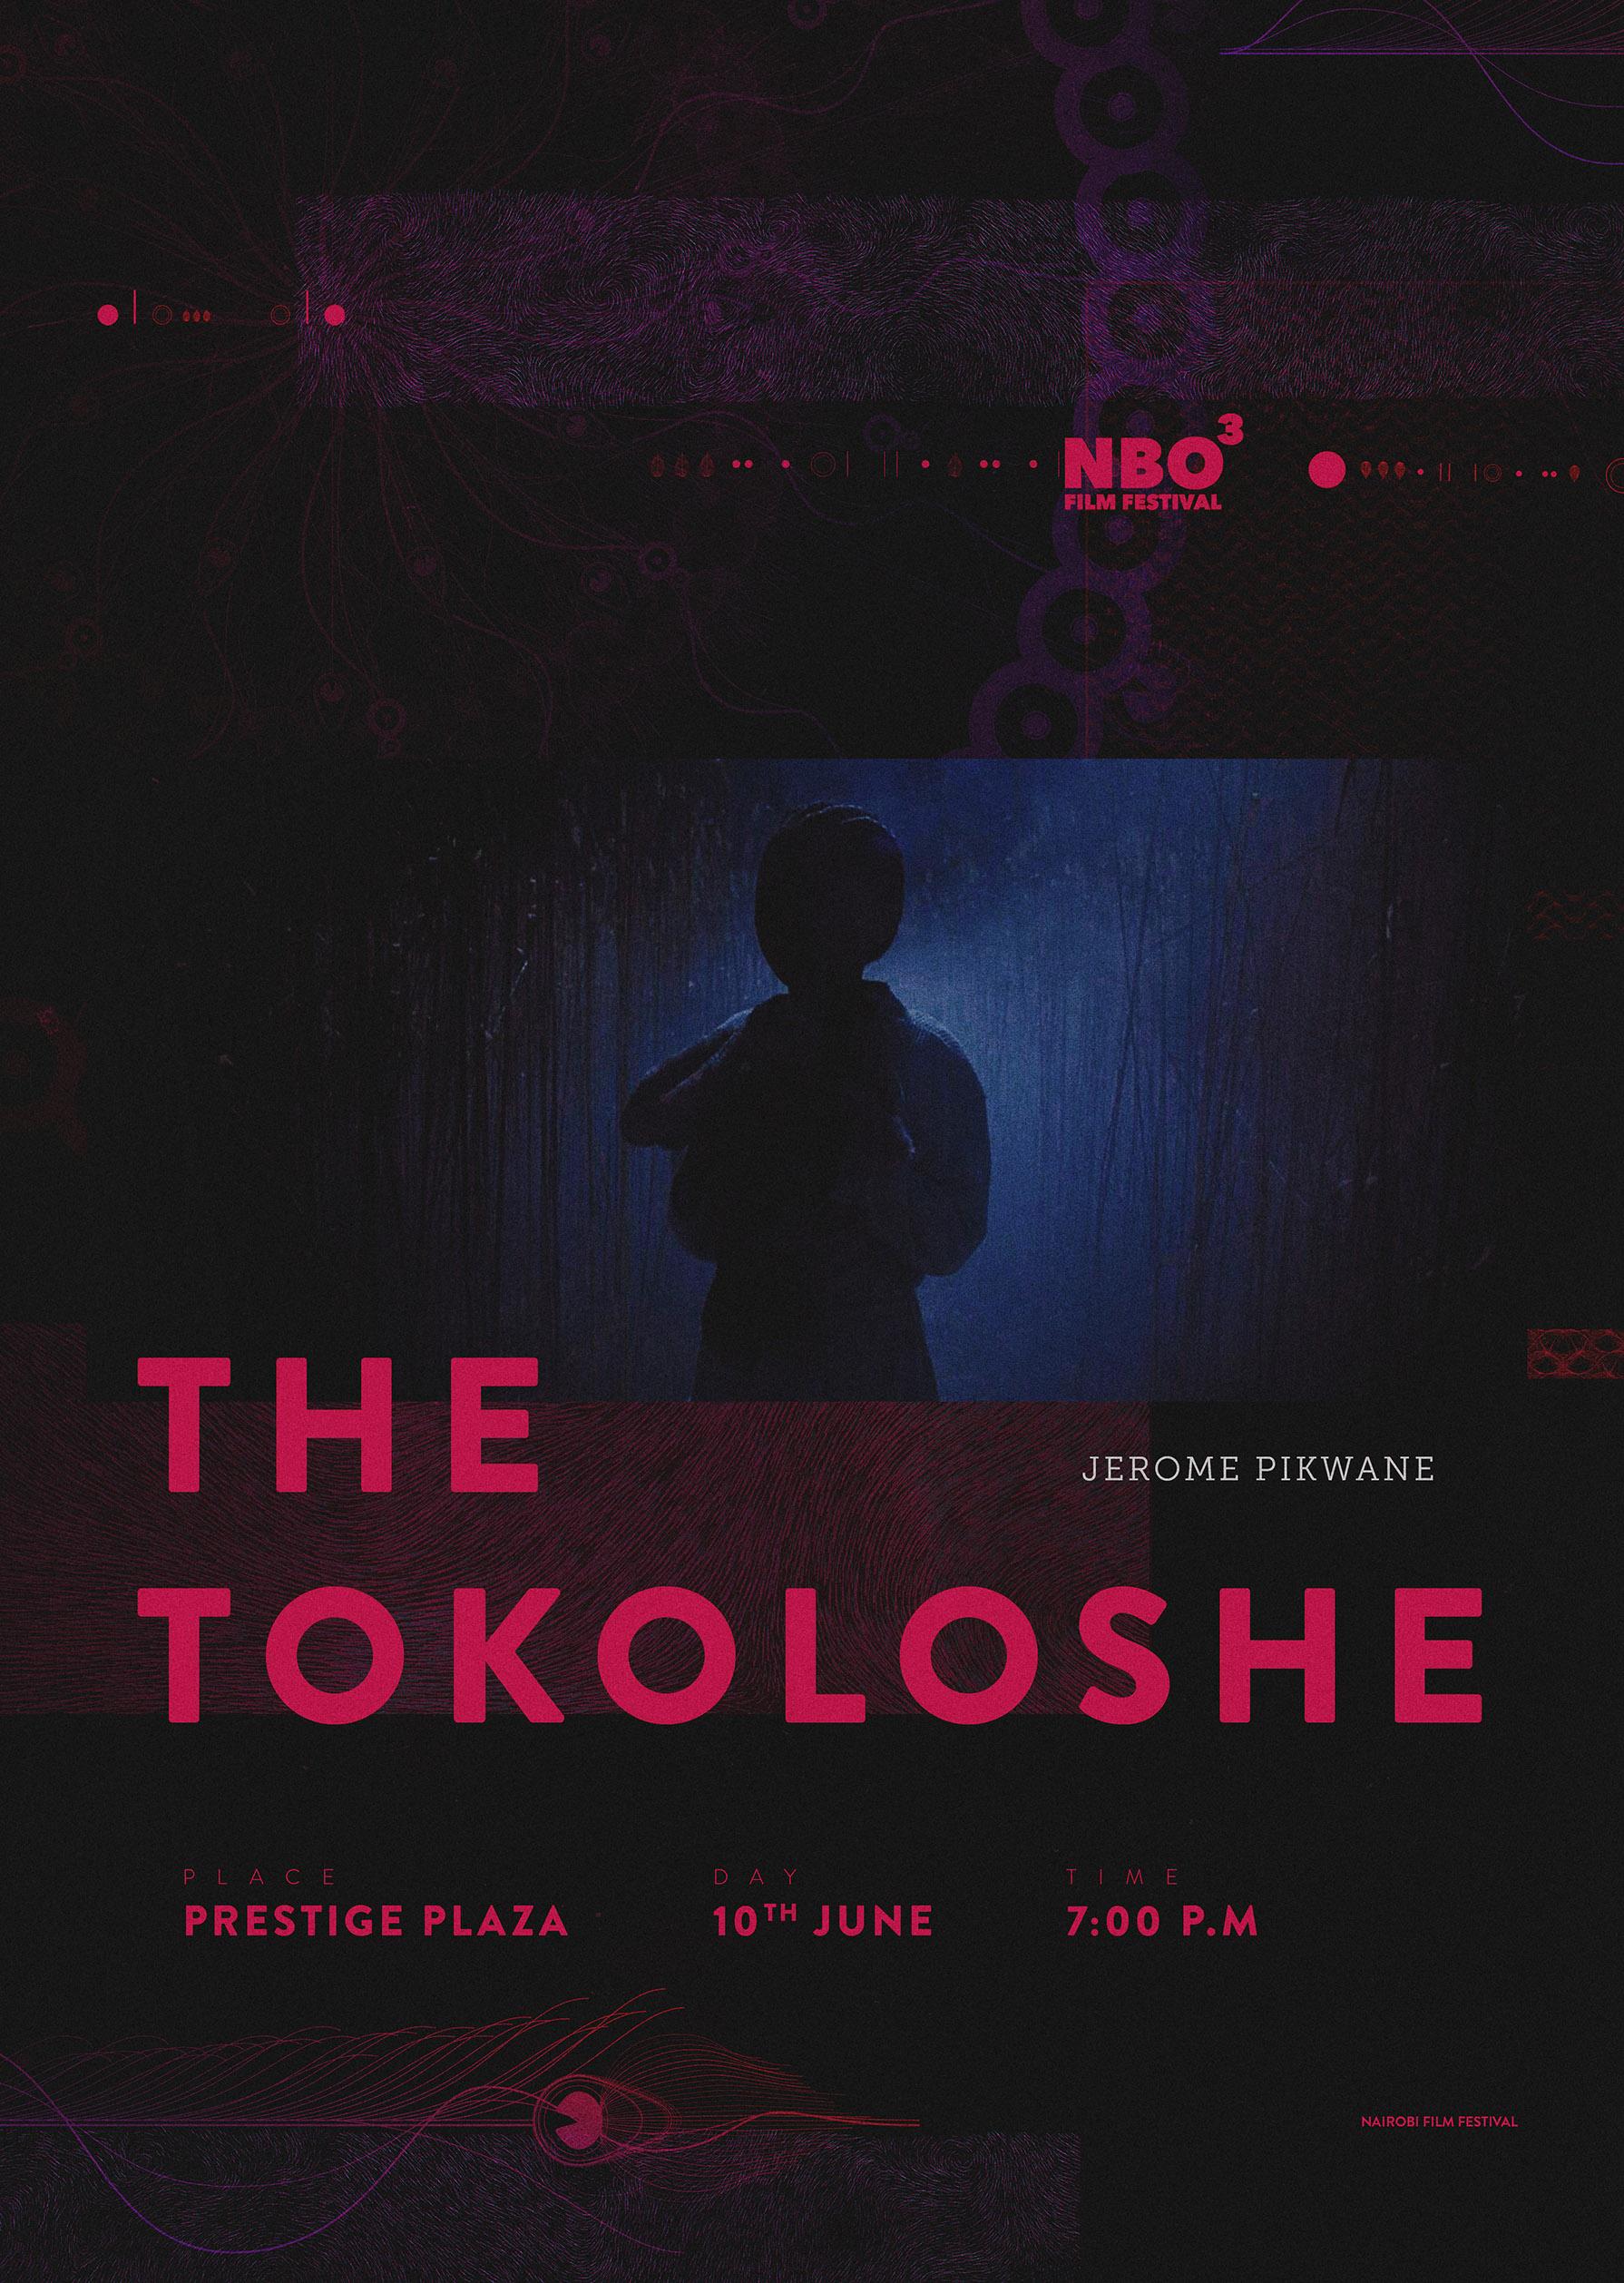 the tokoloshe A3 jpeg.jpg